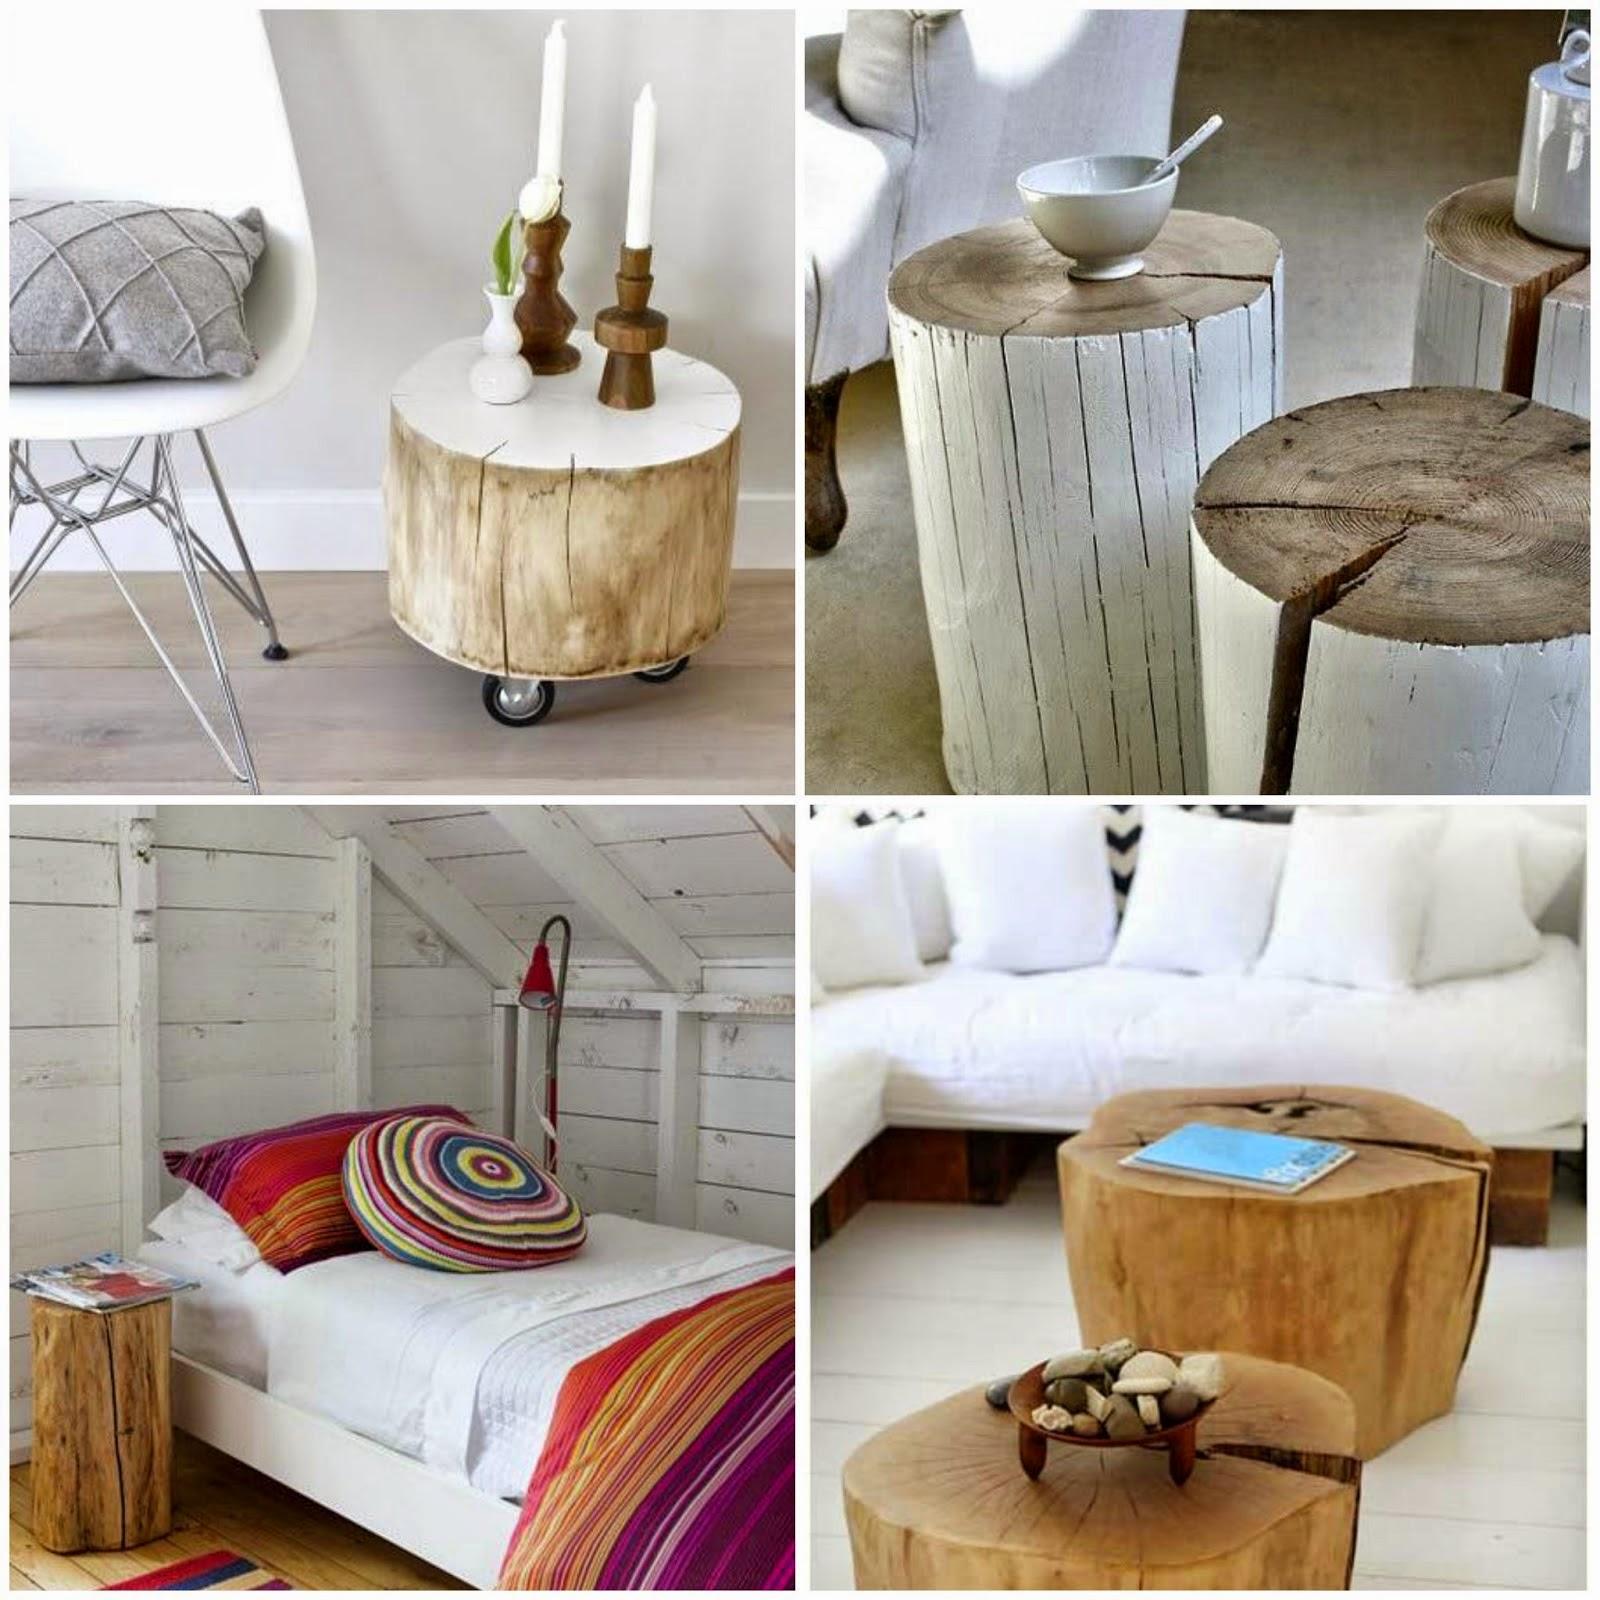 Tronco madera decoracion luis lagos troncos con lmparas para decorar rodajas de madera de - Tronco madera decoracion ...